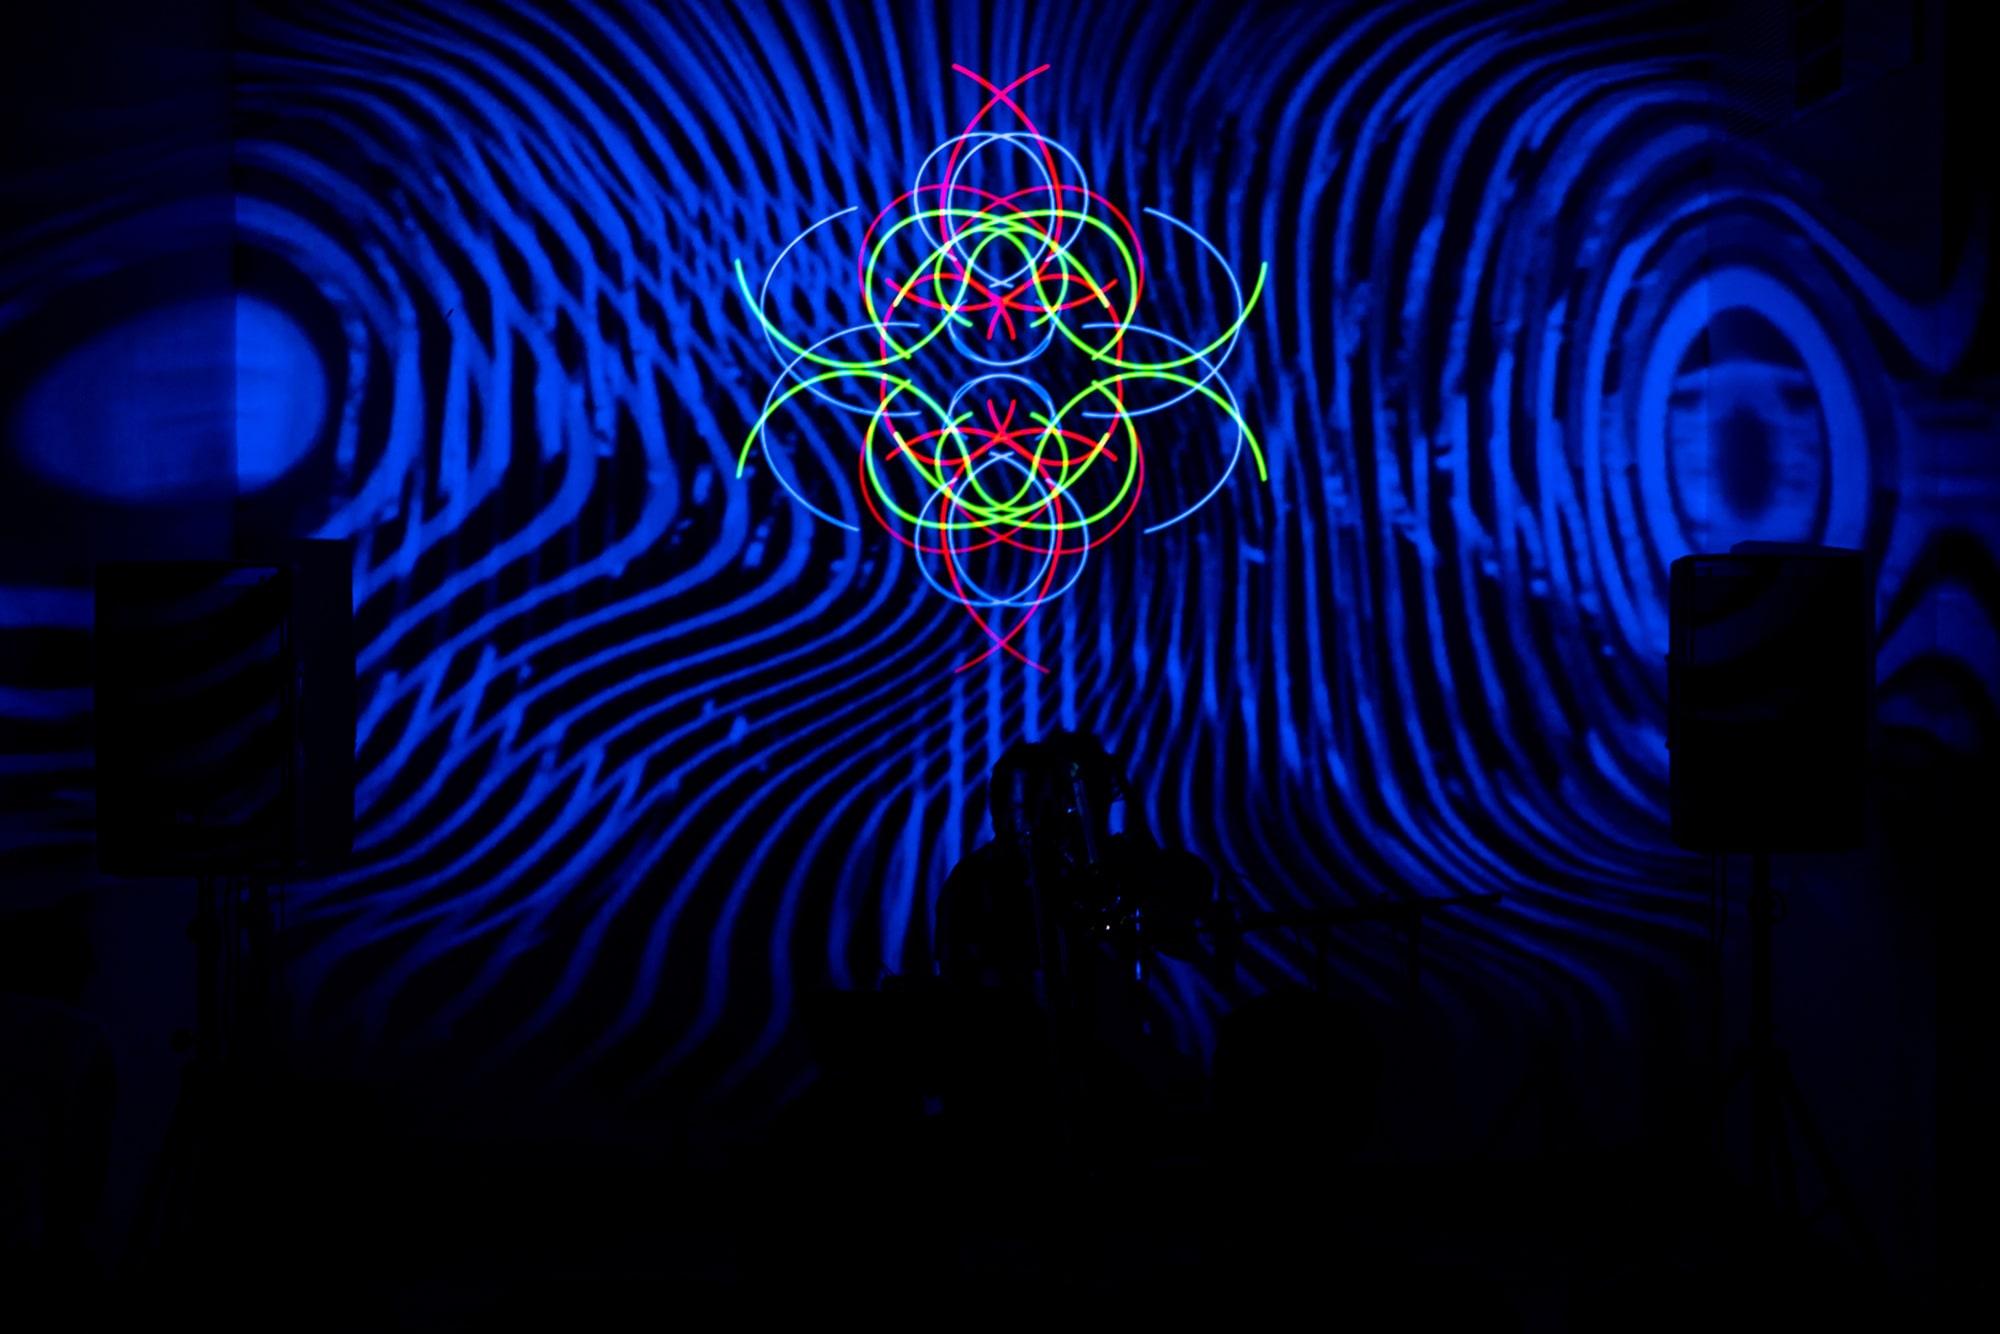 Randy Gibson : Quadrilateral Starfield Symmetry A:A RGB Base 9:162